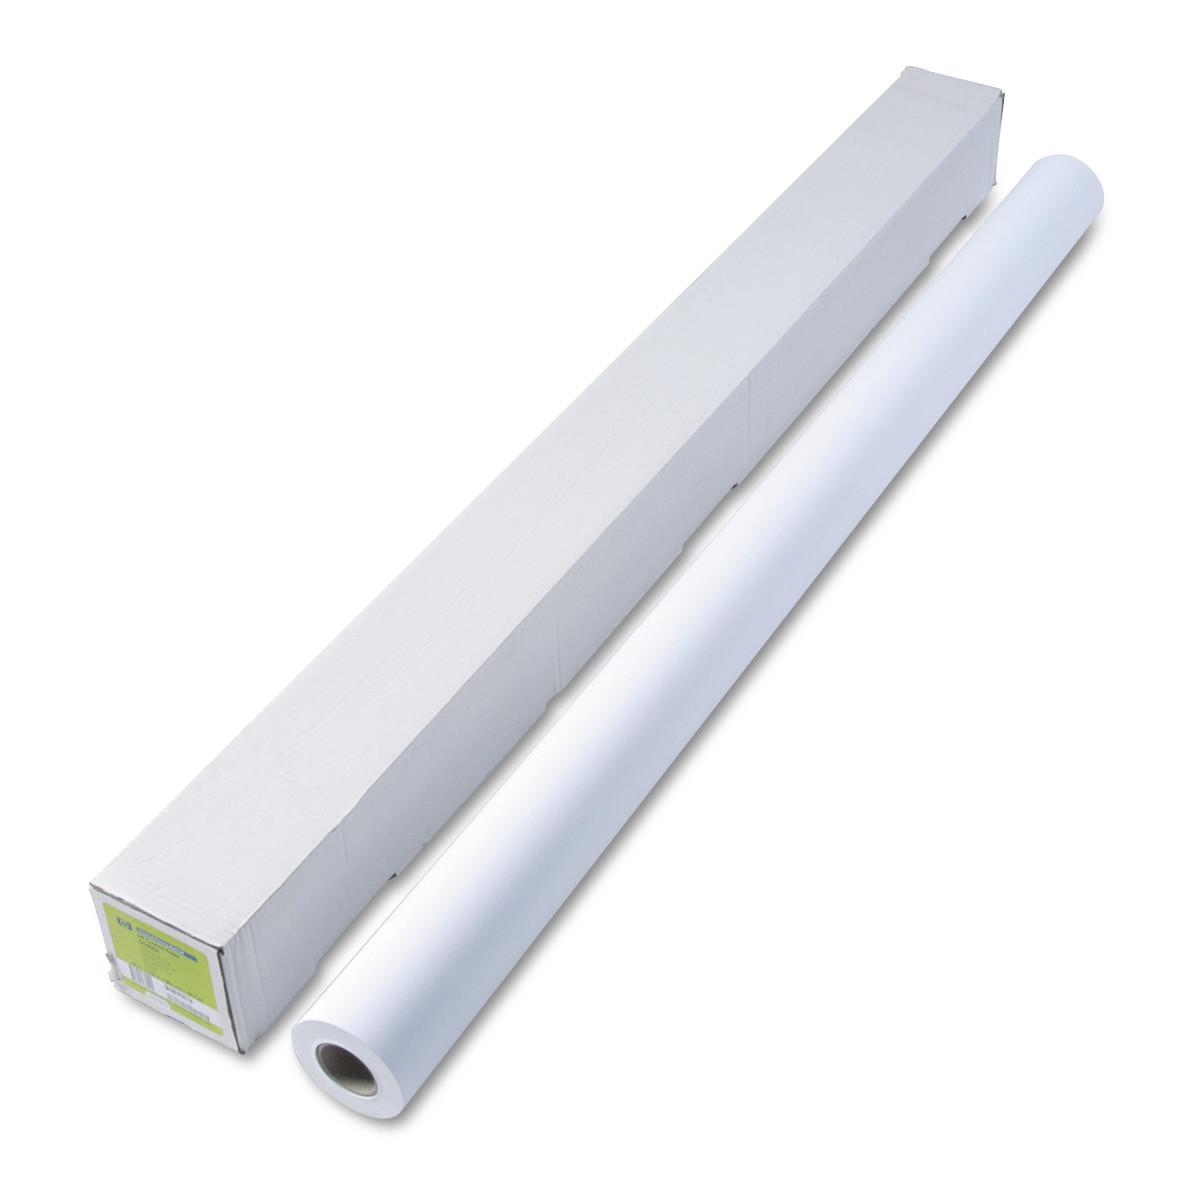 "HP Designjet Inkjet Large Format Paper, 26 lbs., 60"" x 150 ft, White"